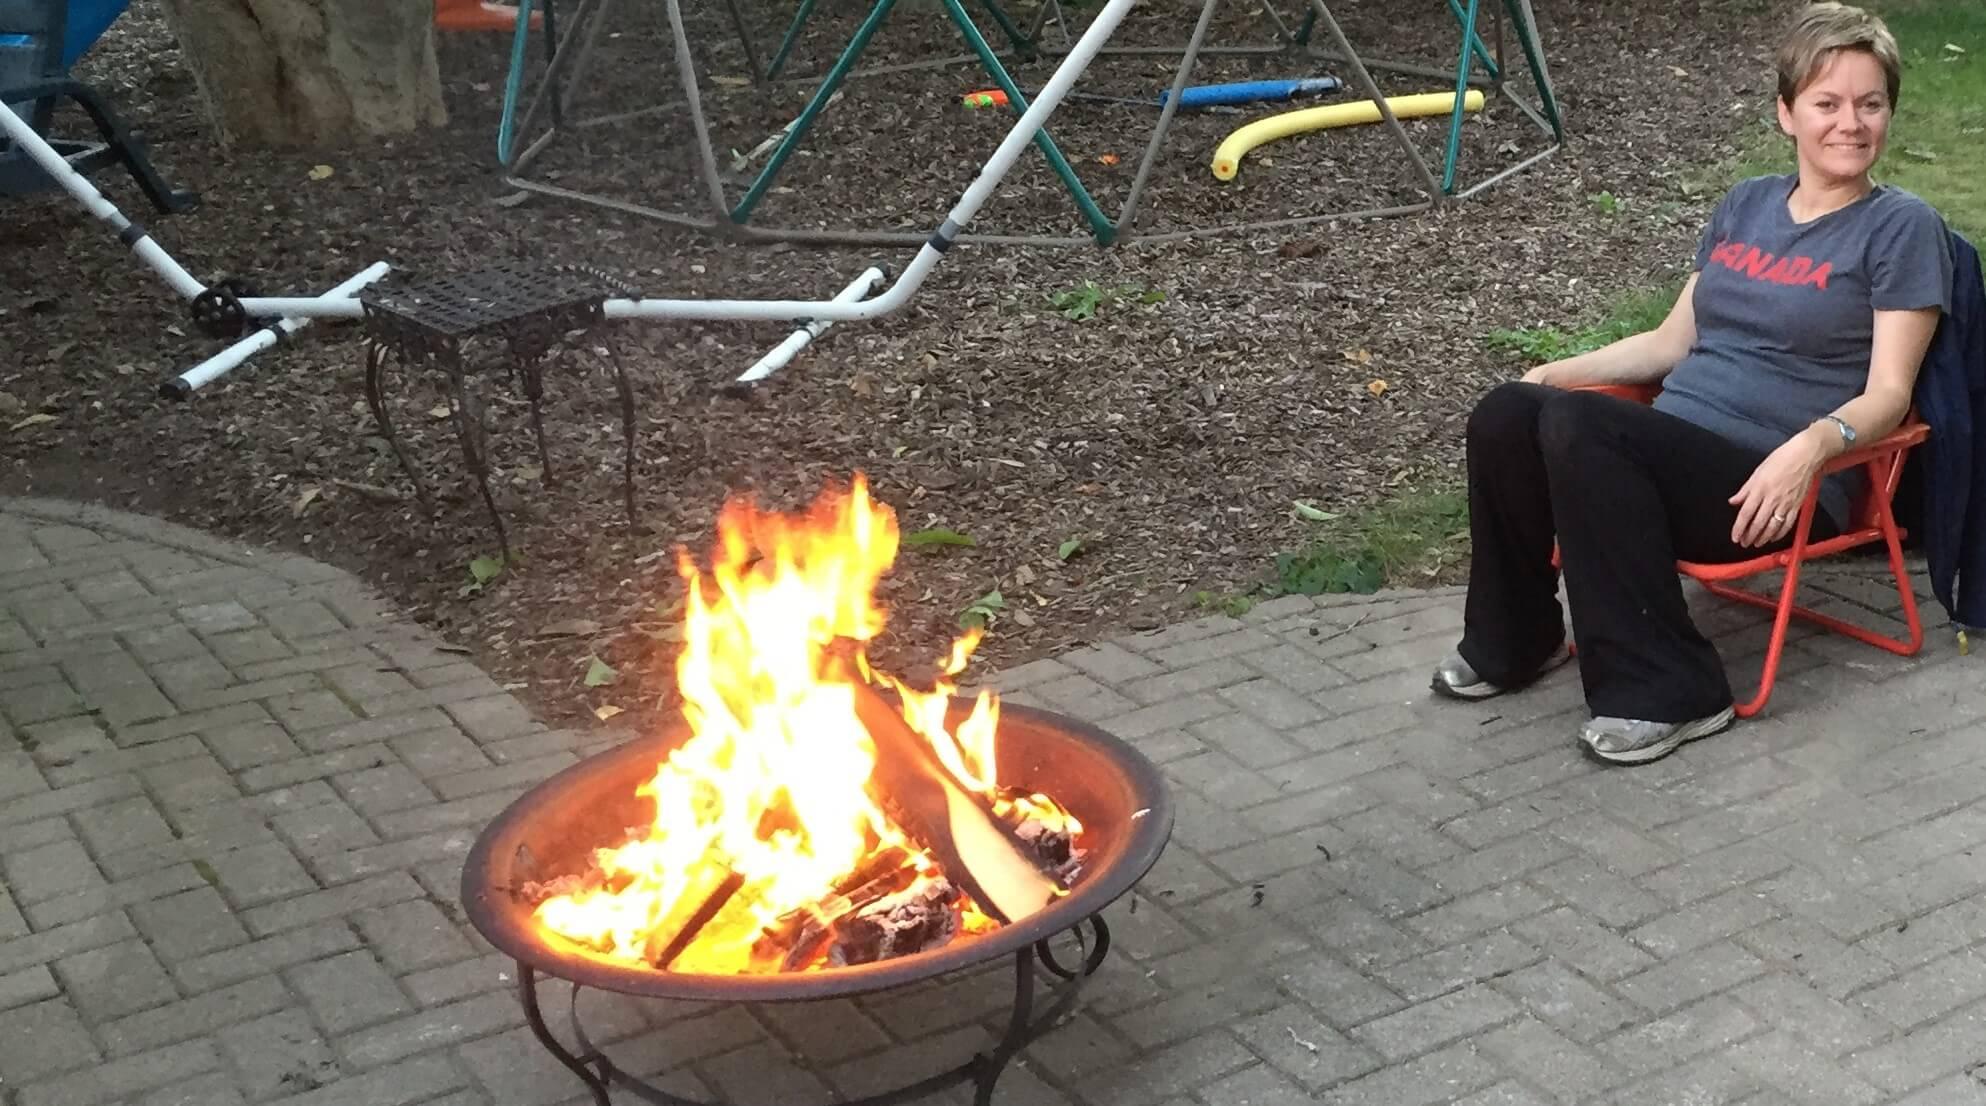 hannah-brown-sitting-by-backyard-campfire